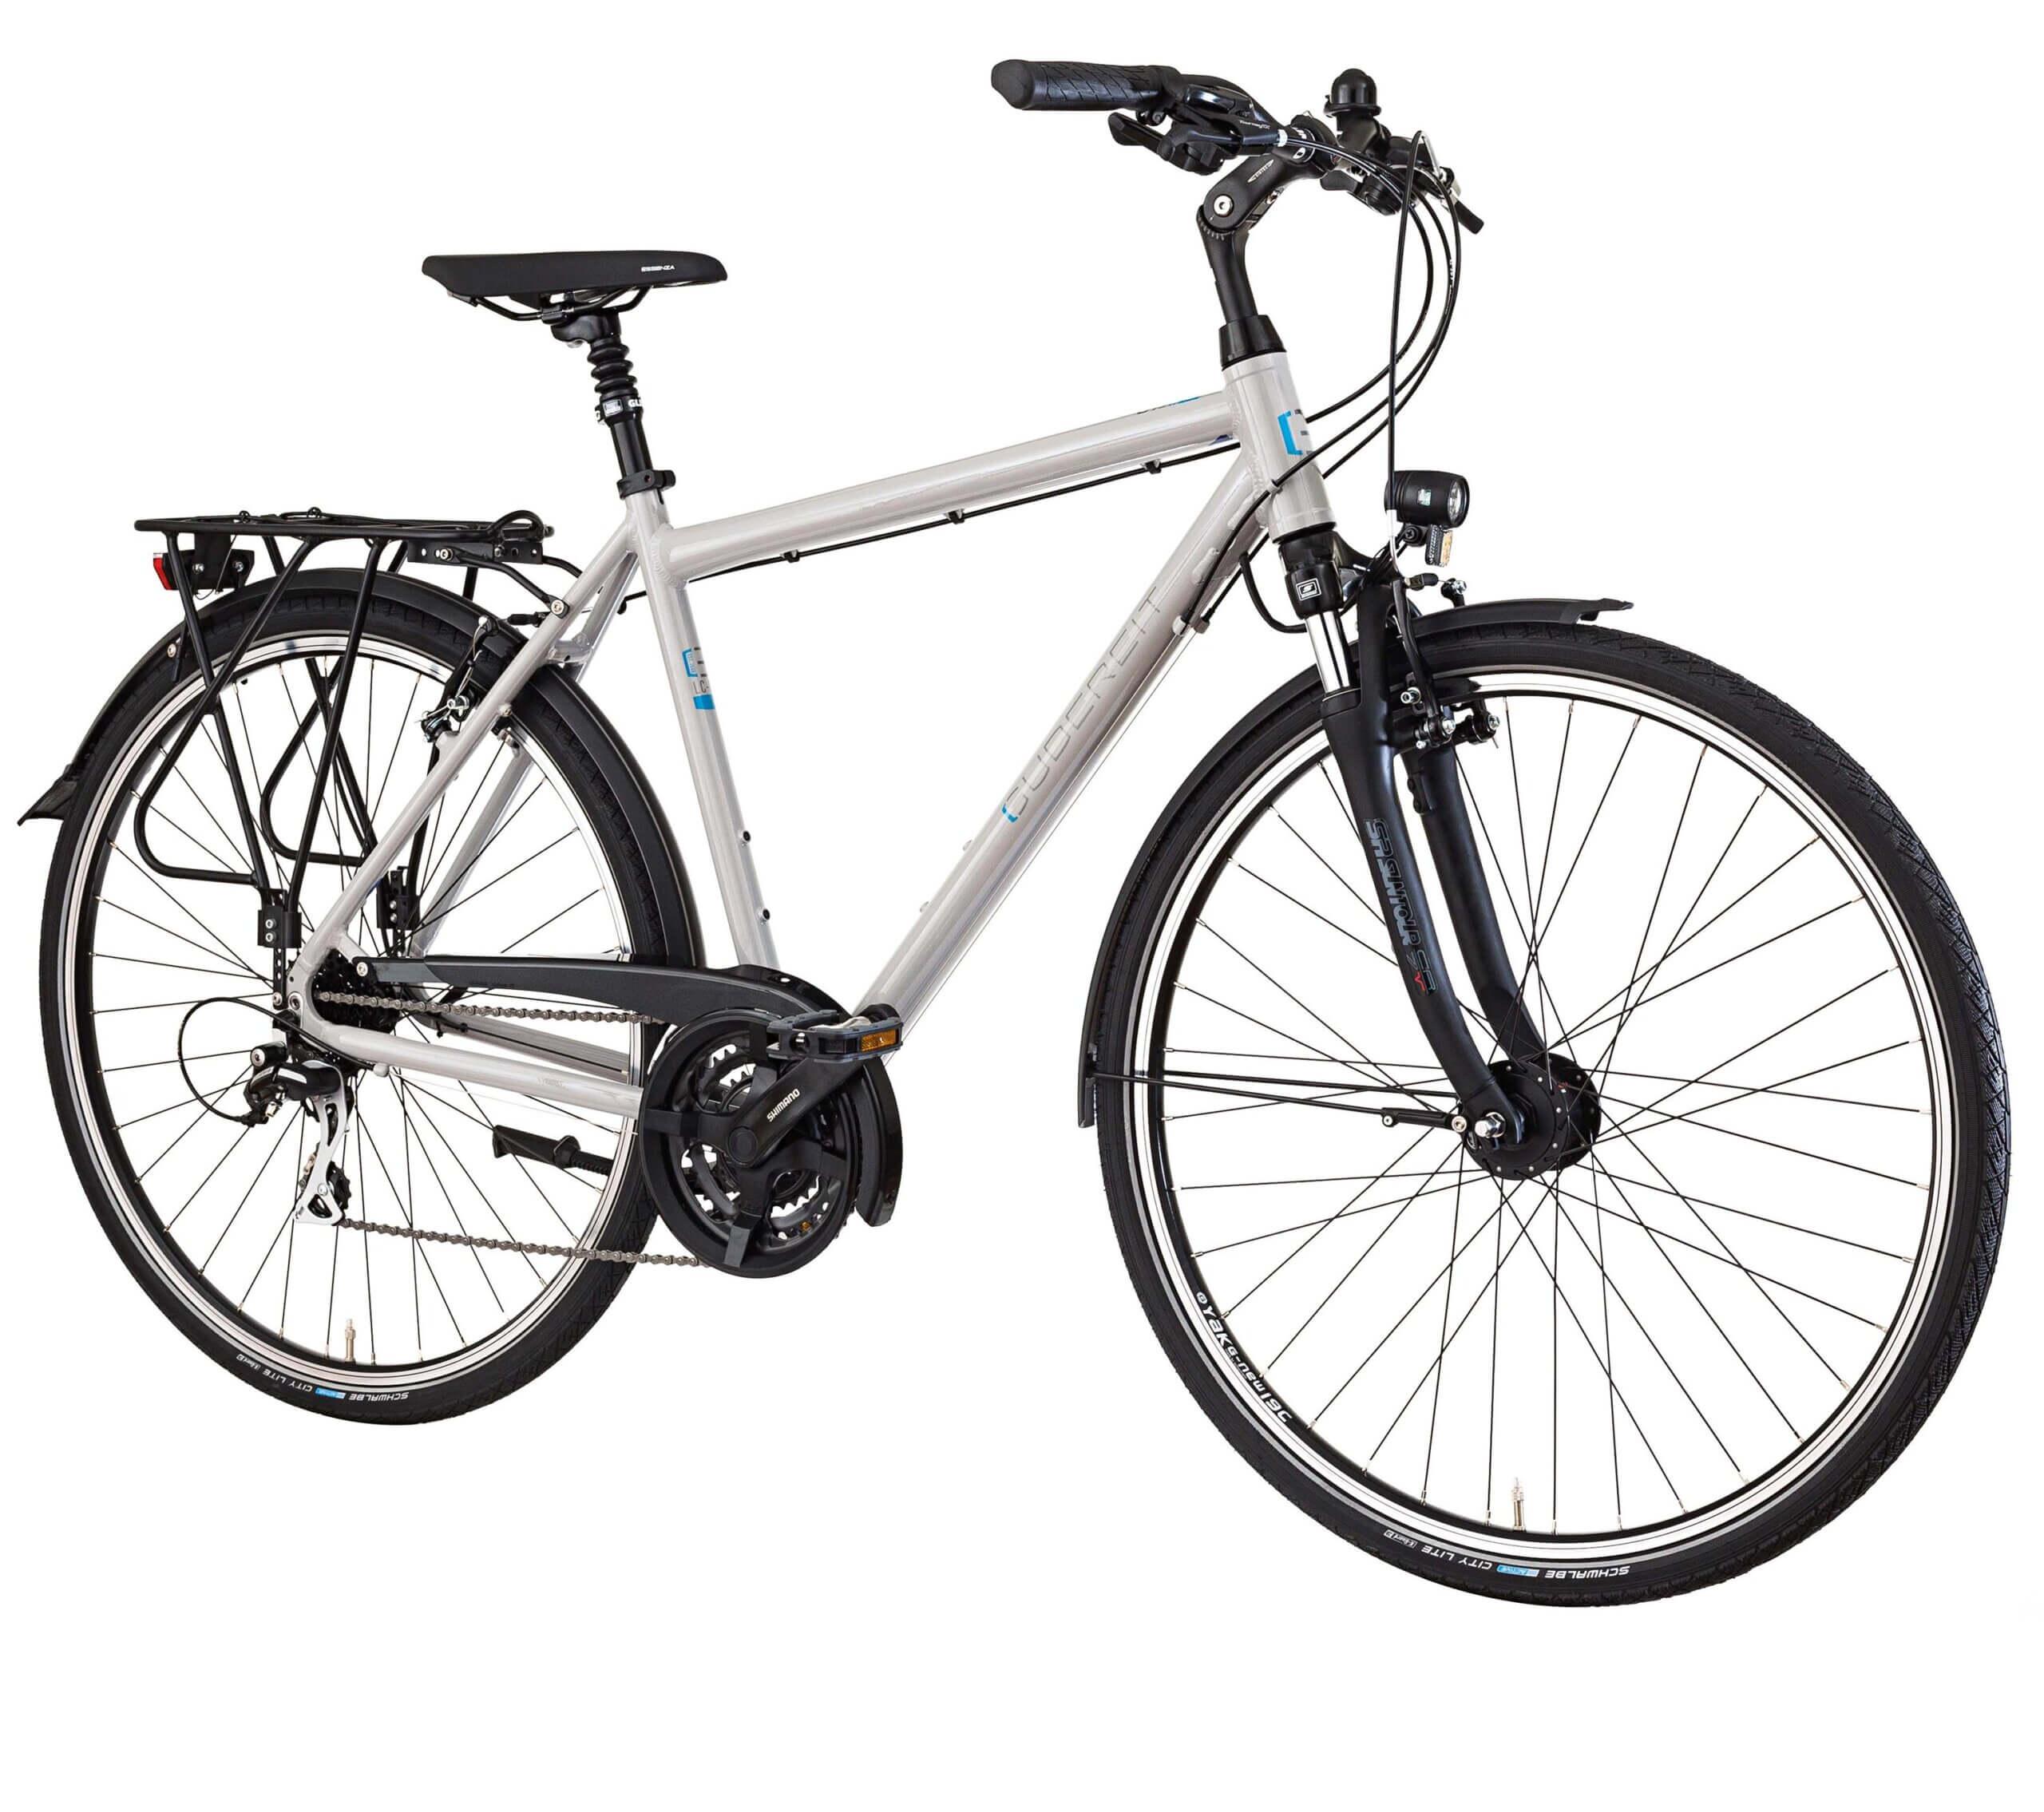 Eldorado Trekkingrad Fahrrad Gudereit Trekking Amrum Fahrradverleih